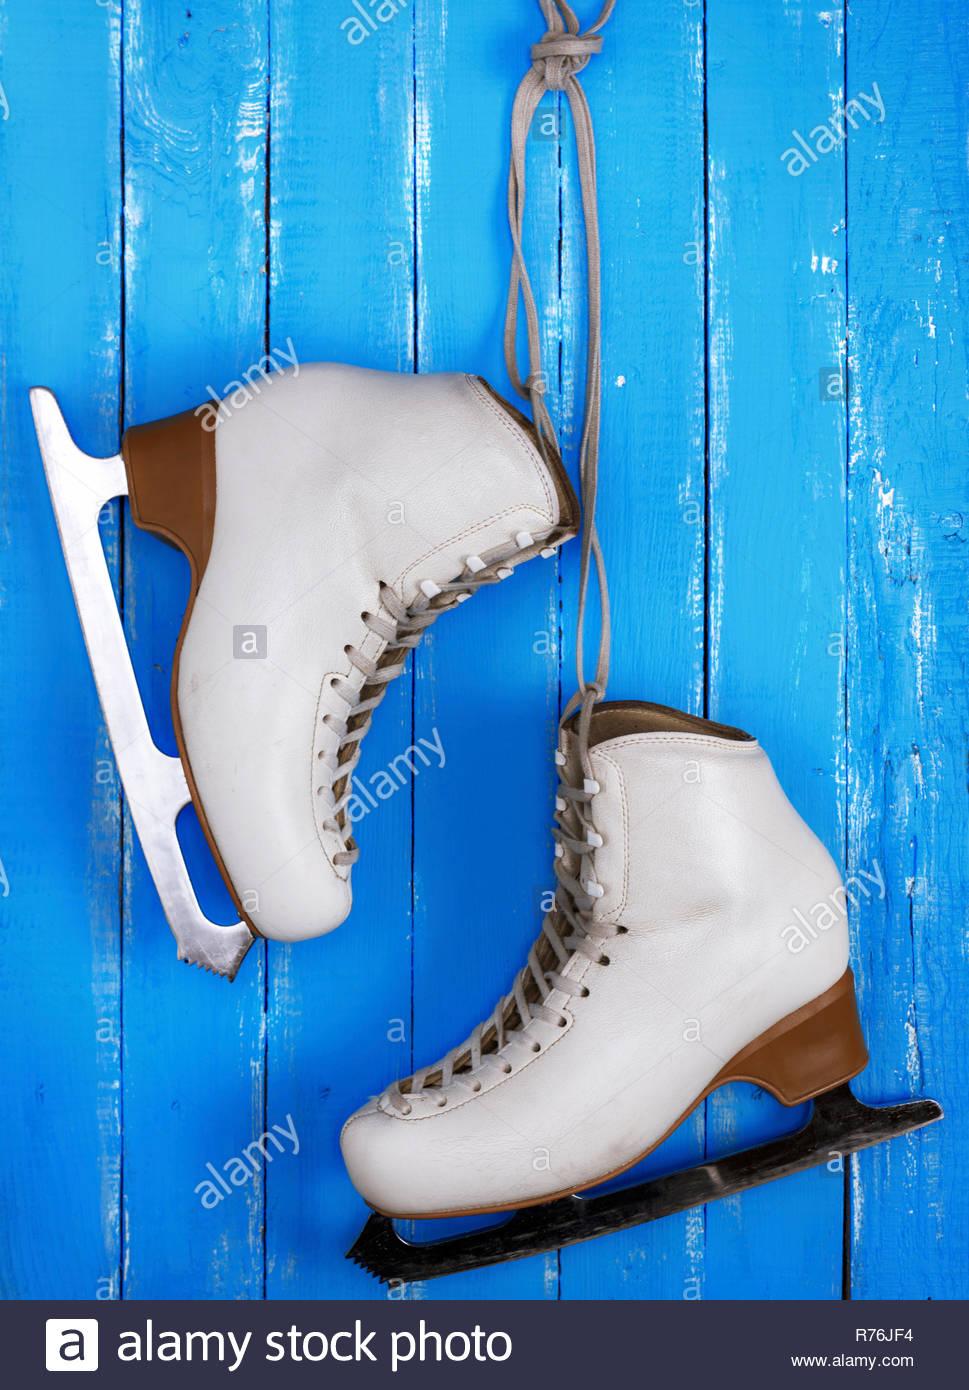 5fe08001c0ba9 pair of white leather female skates for figure skating Stock Photo ...